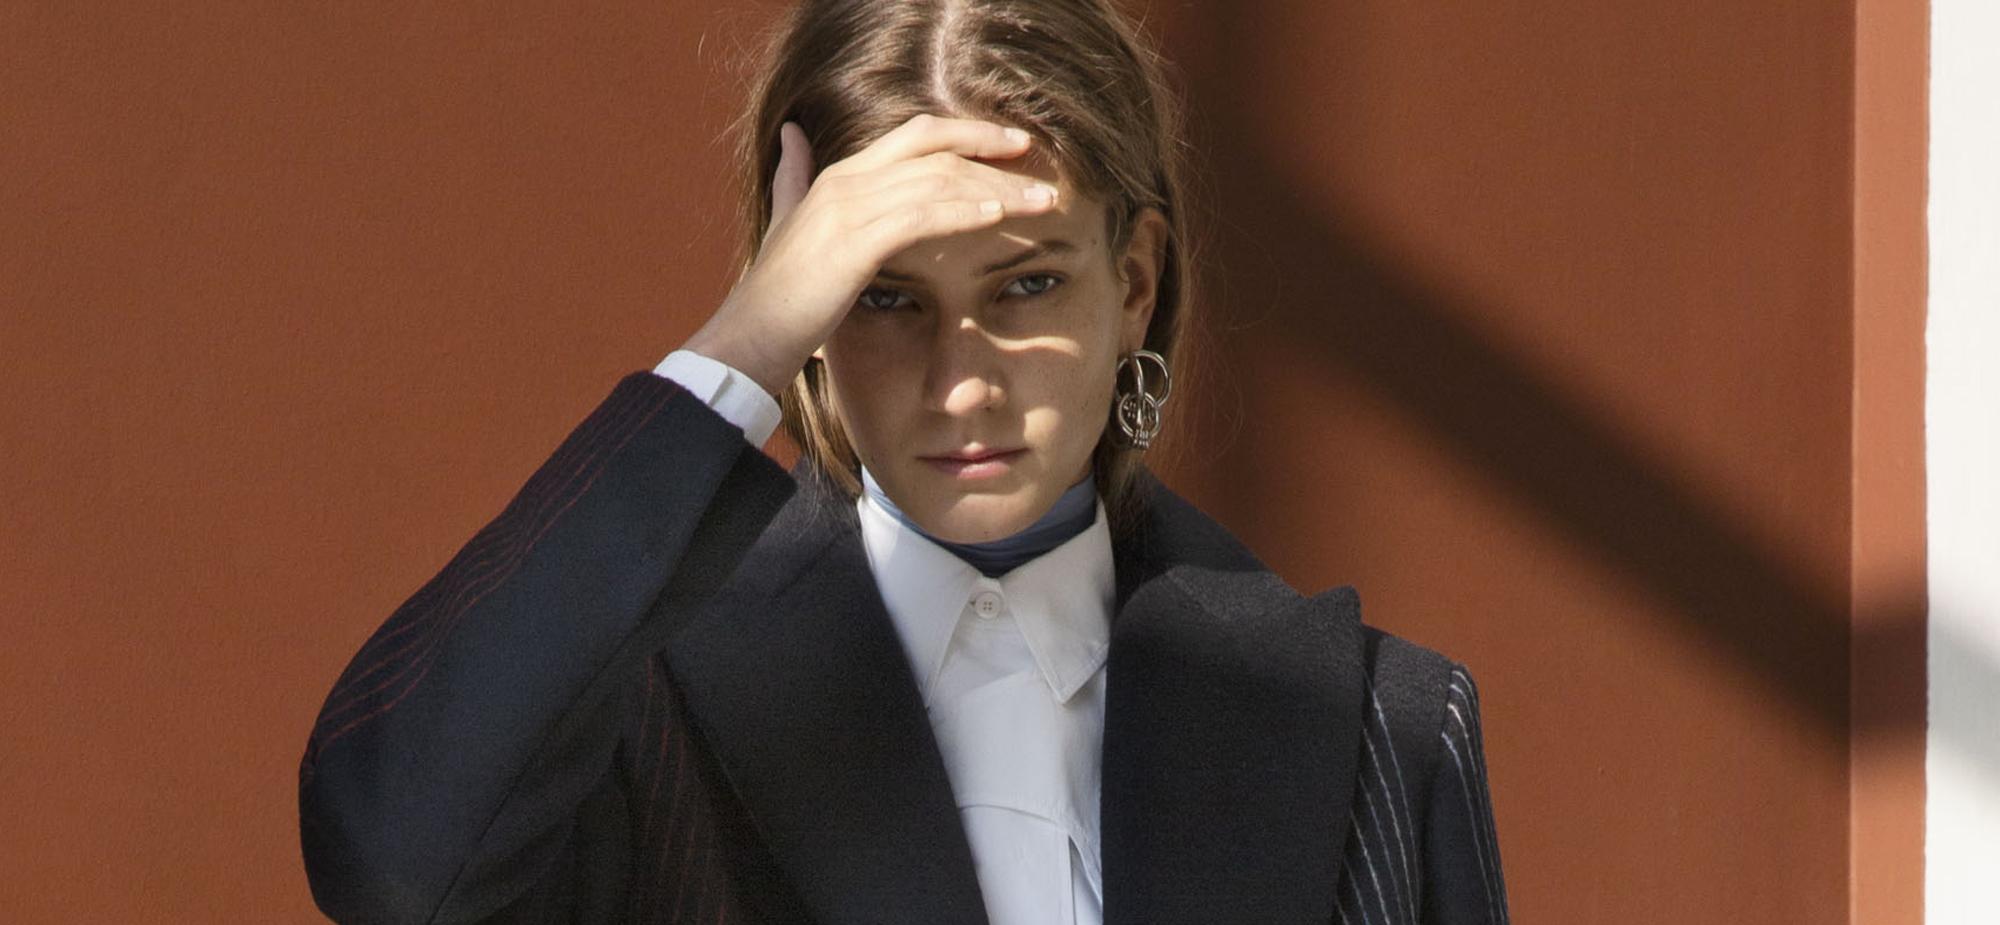 SLIDER #maxmara #prefall2019 #prefall19 #sportmax #fashion #womenfashion #women #newcollection